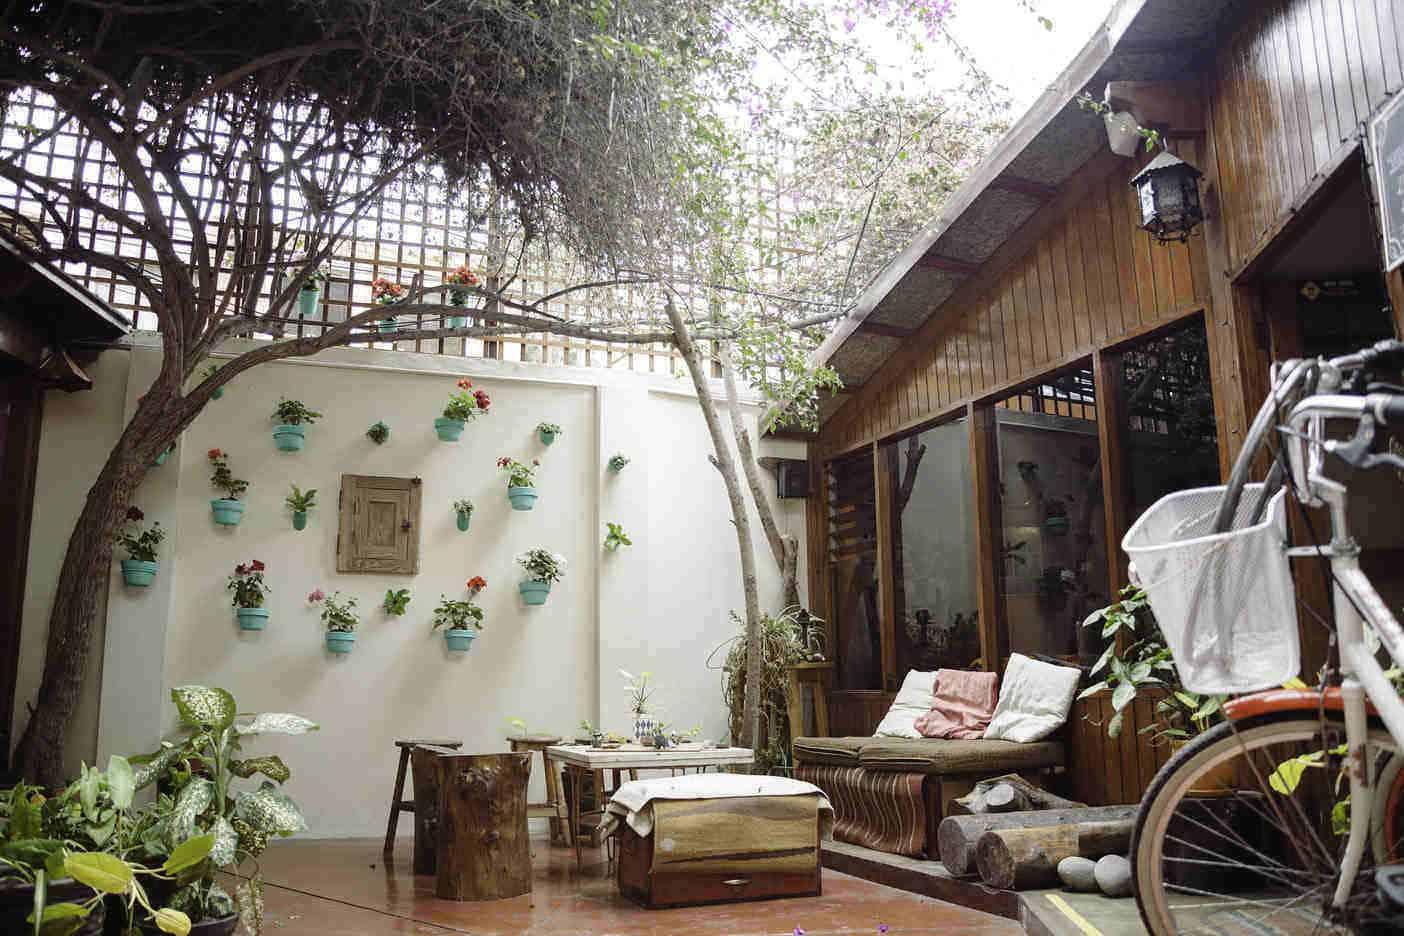 D'osma flower pot decorated patio